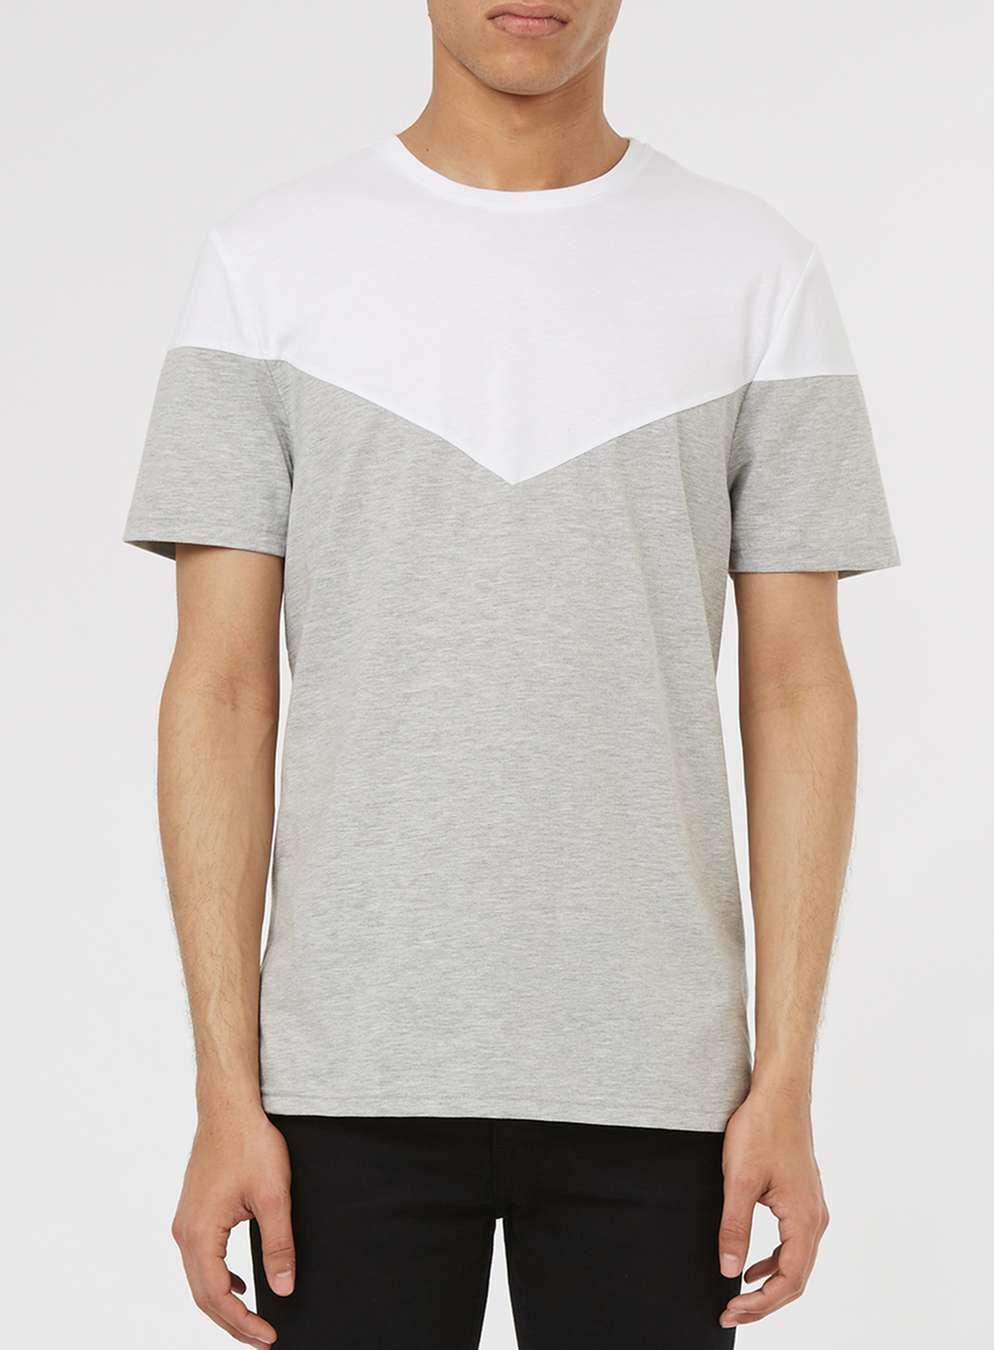 White and Grey Chevron T-Shirt - Topman